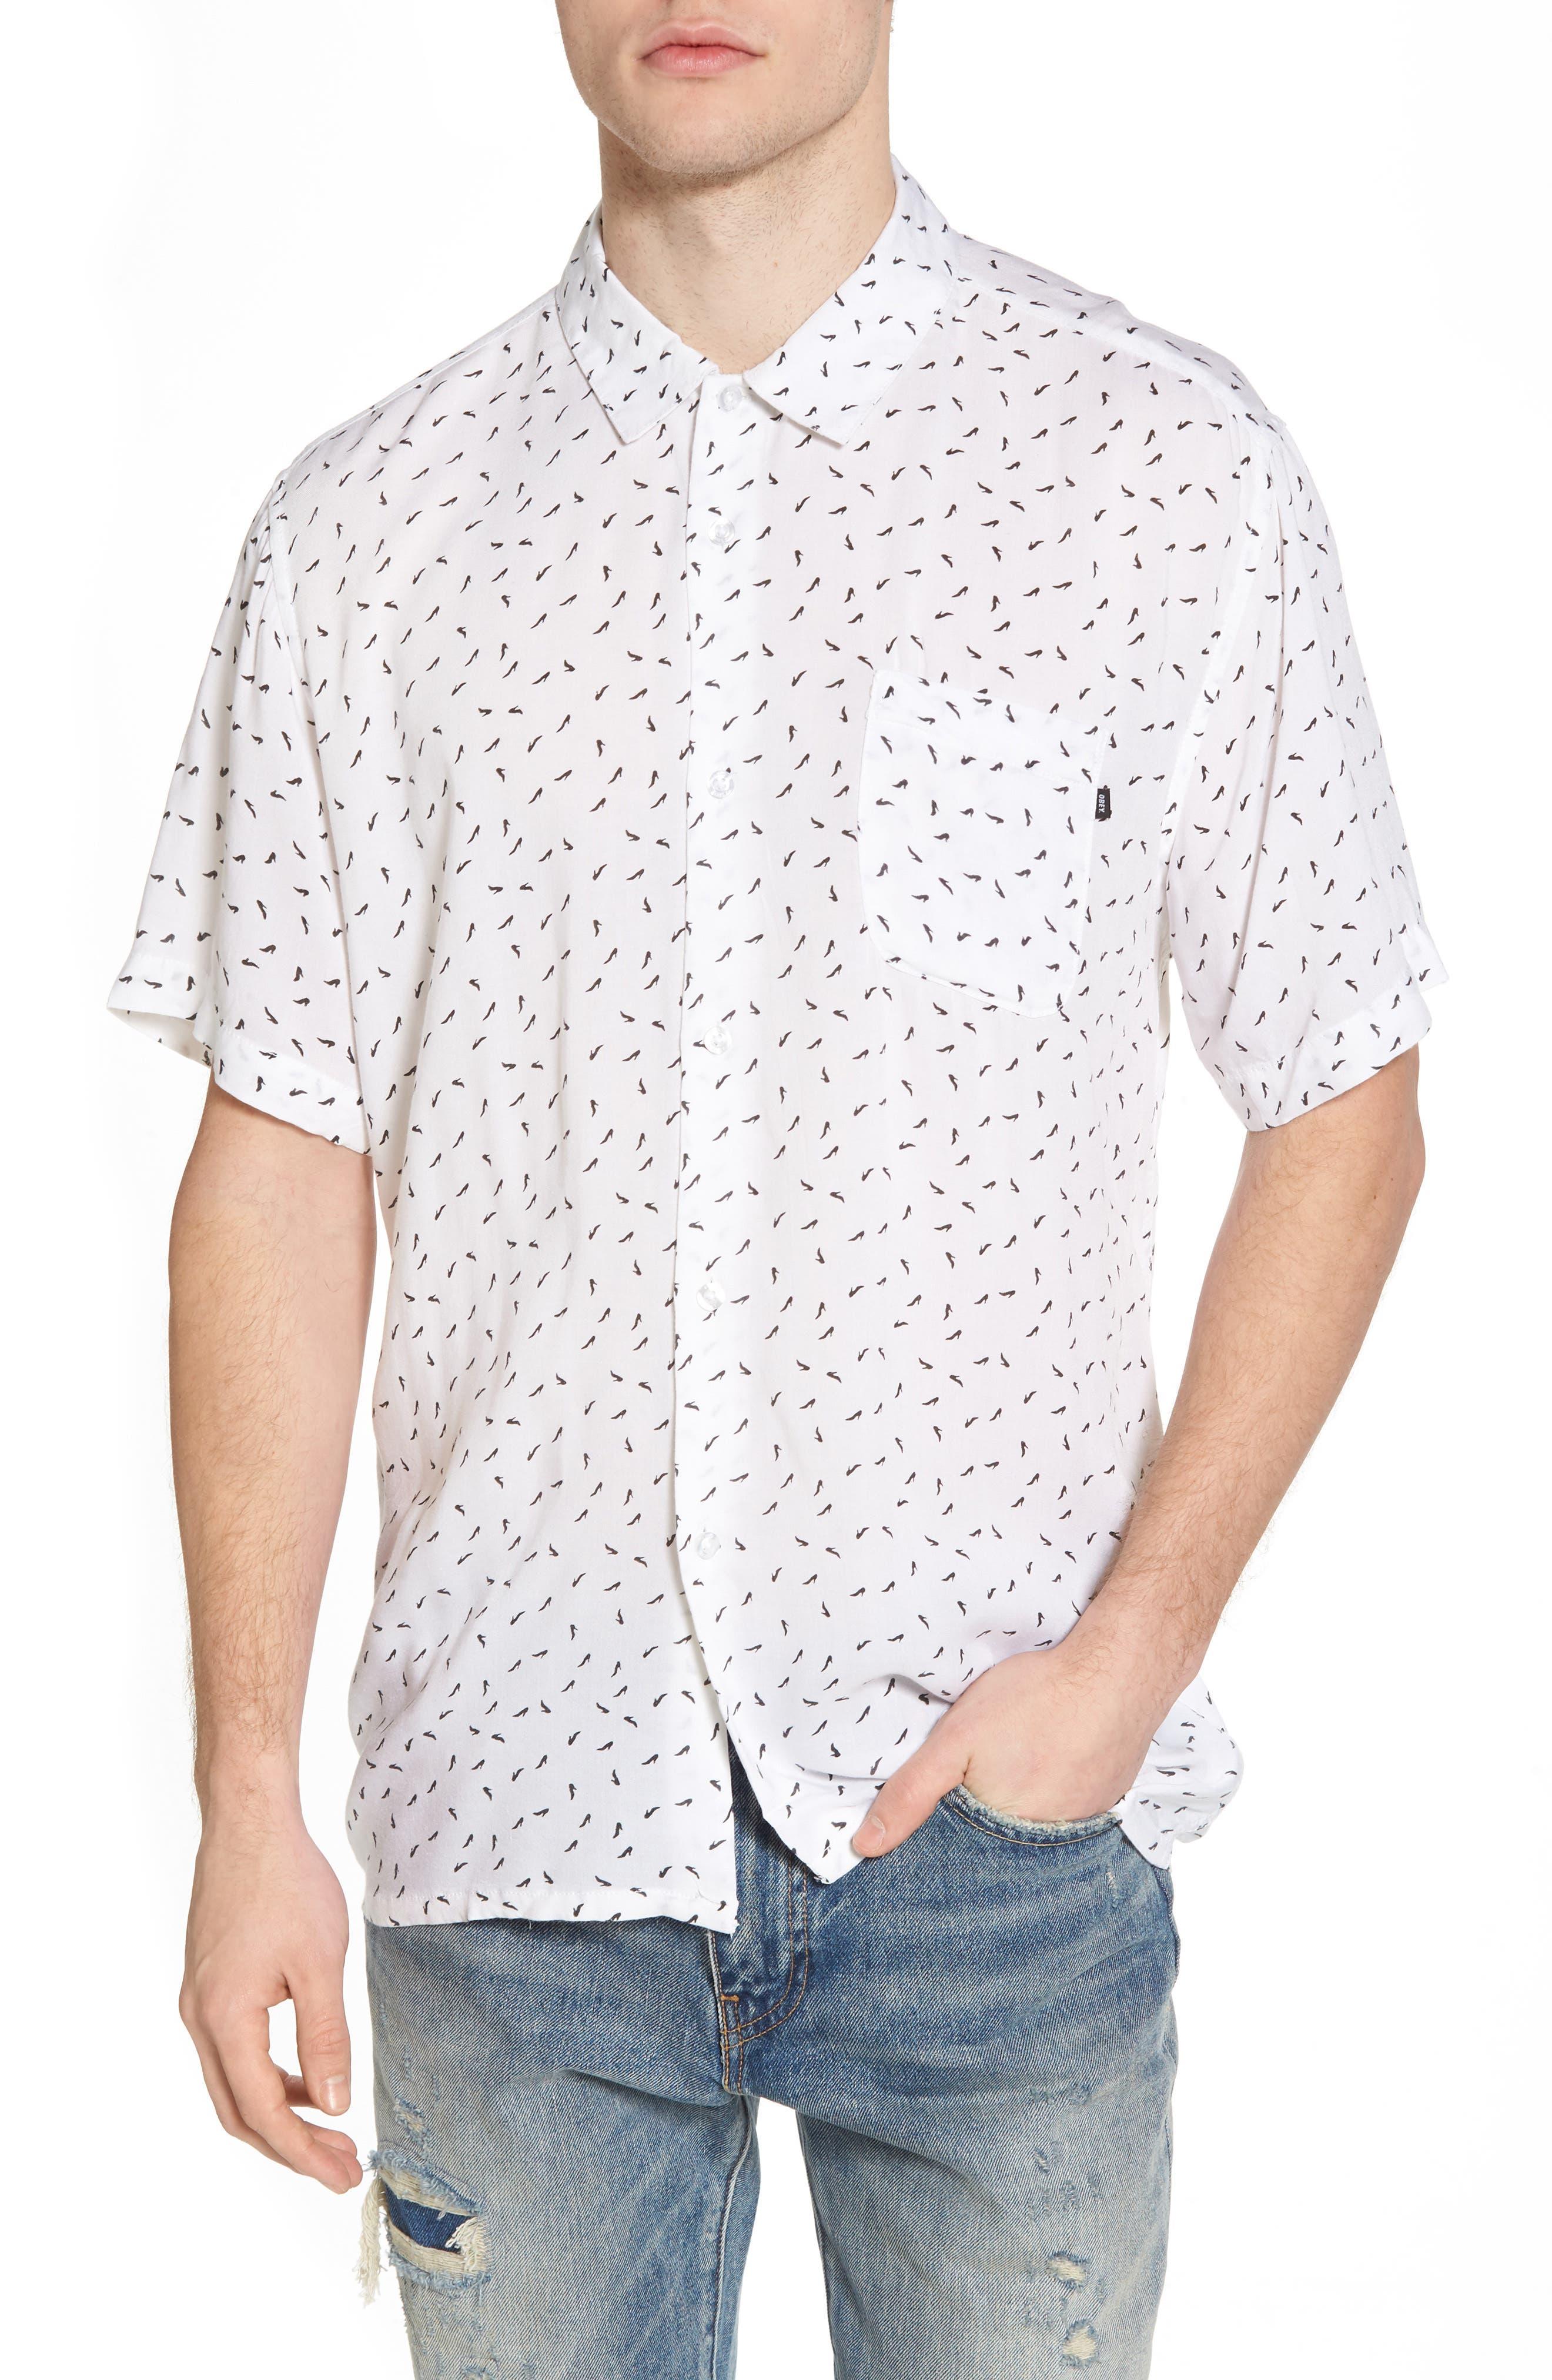 Pumps Short Sleeve Shirt,                             Main thumbnail 1, color,                             White Multi